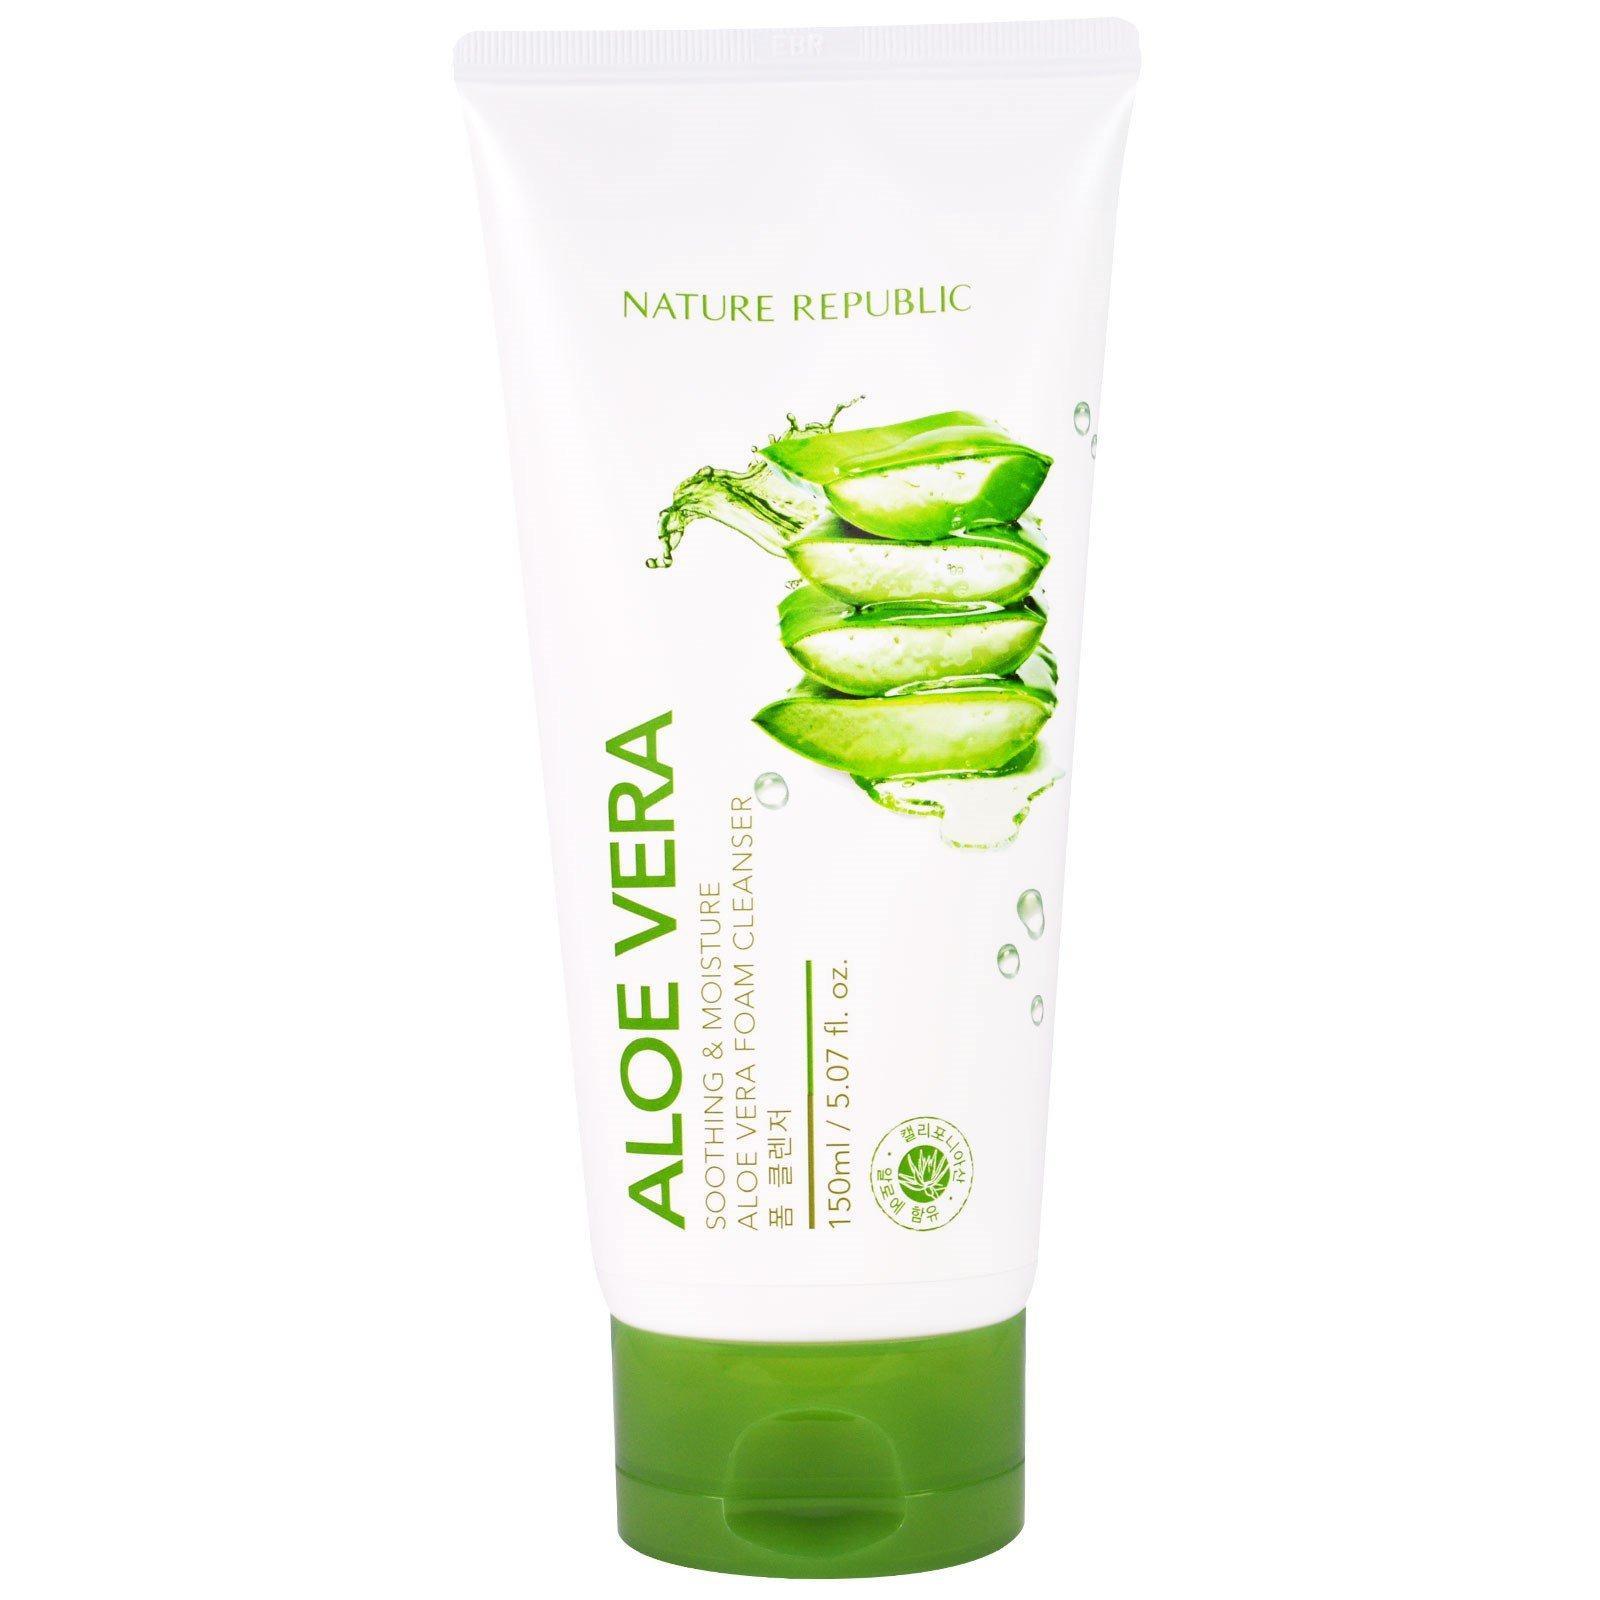 Nature Republic Aloe Vera Soothing & Moisture Foam Cleanser Sabun Pembersih Wajah Aloe Vera Sabun Cuci Muka Aloe Vera - 150ml